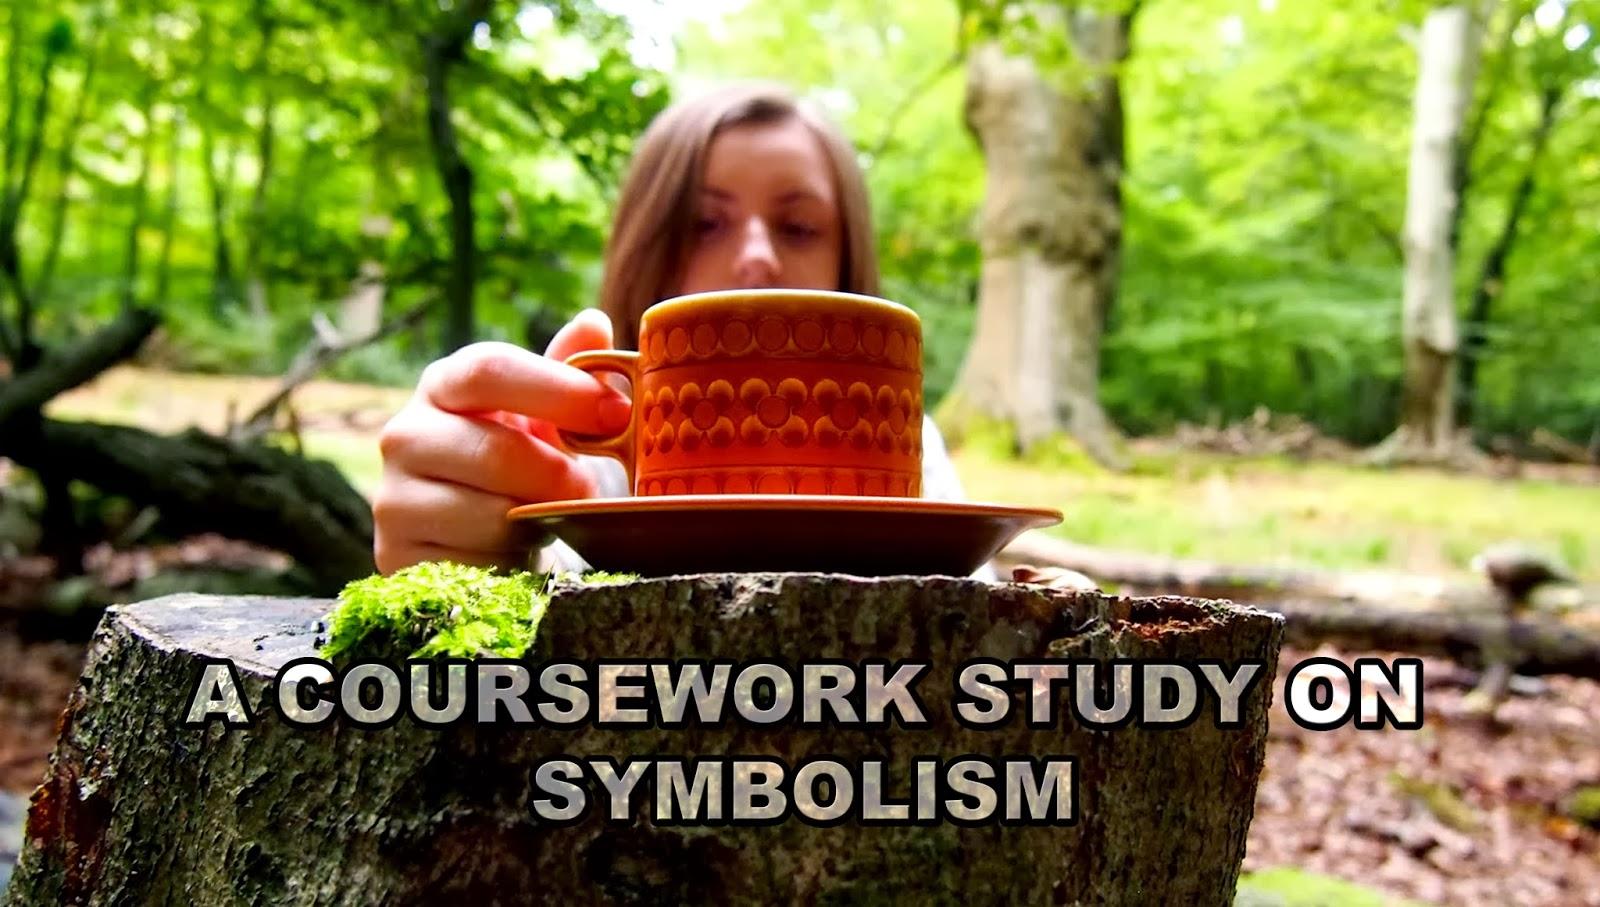 Should Homework Be Abolished Or Not